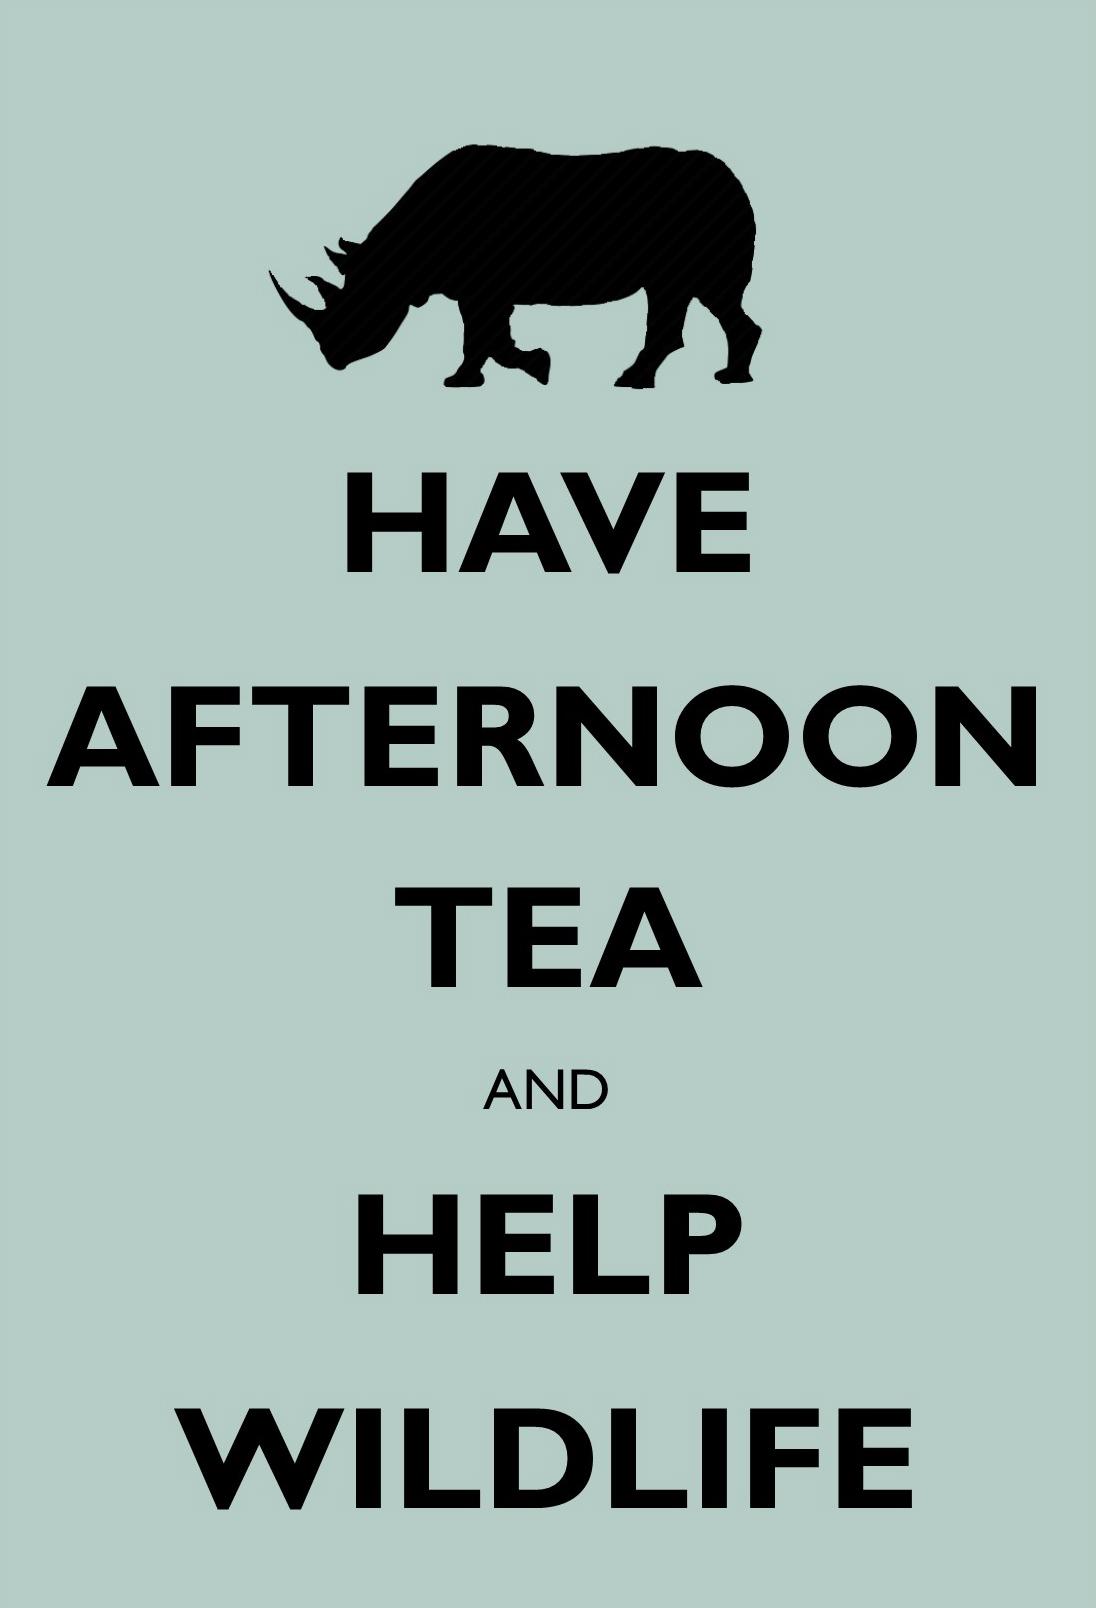 Help Wildlife Rhino